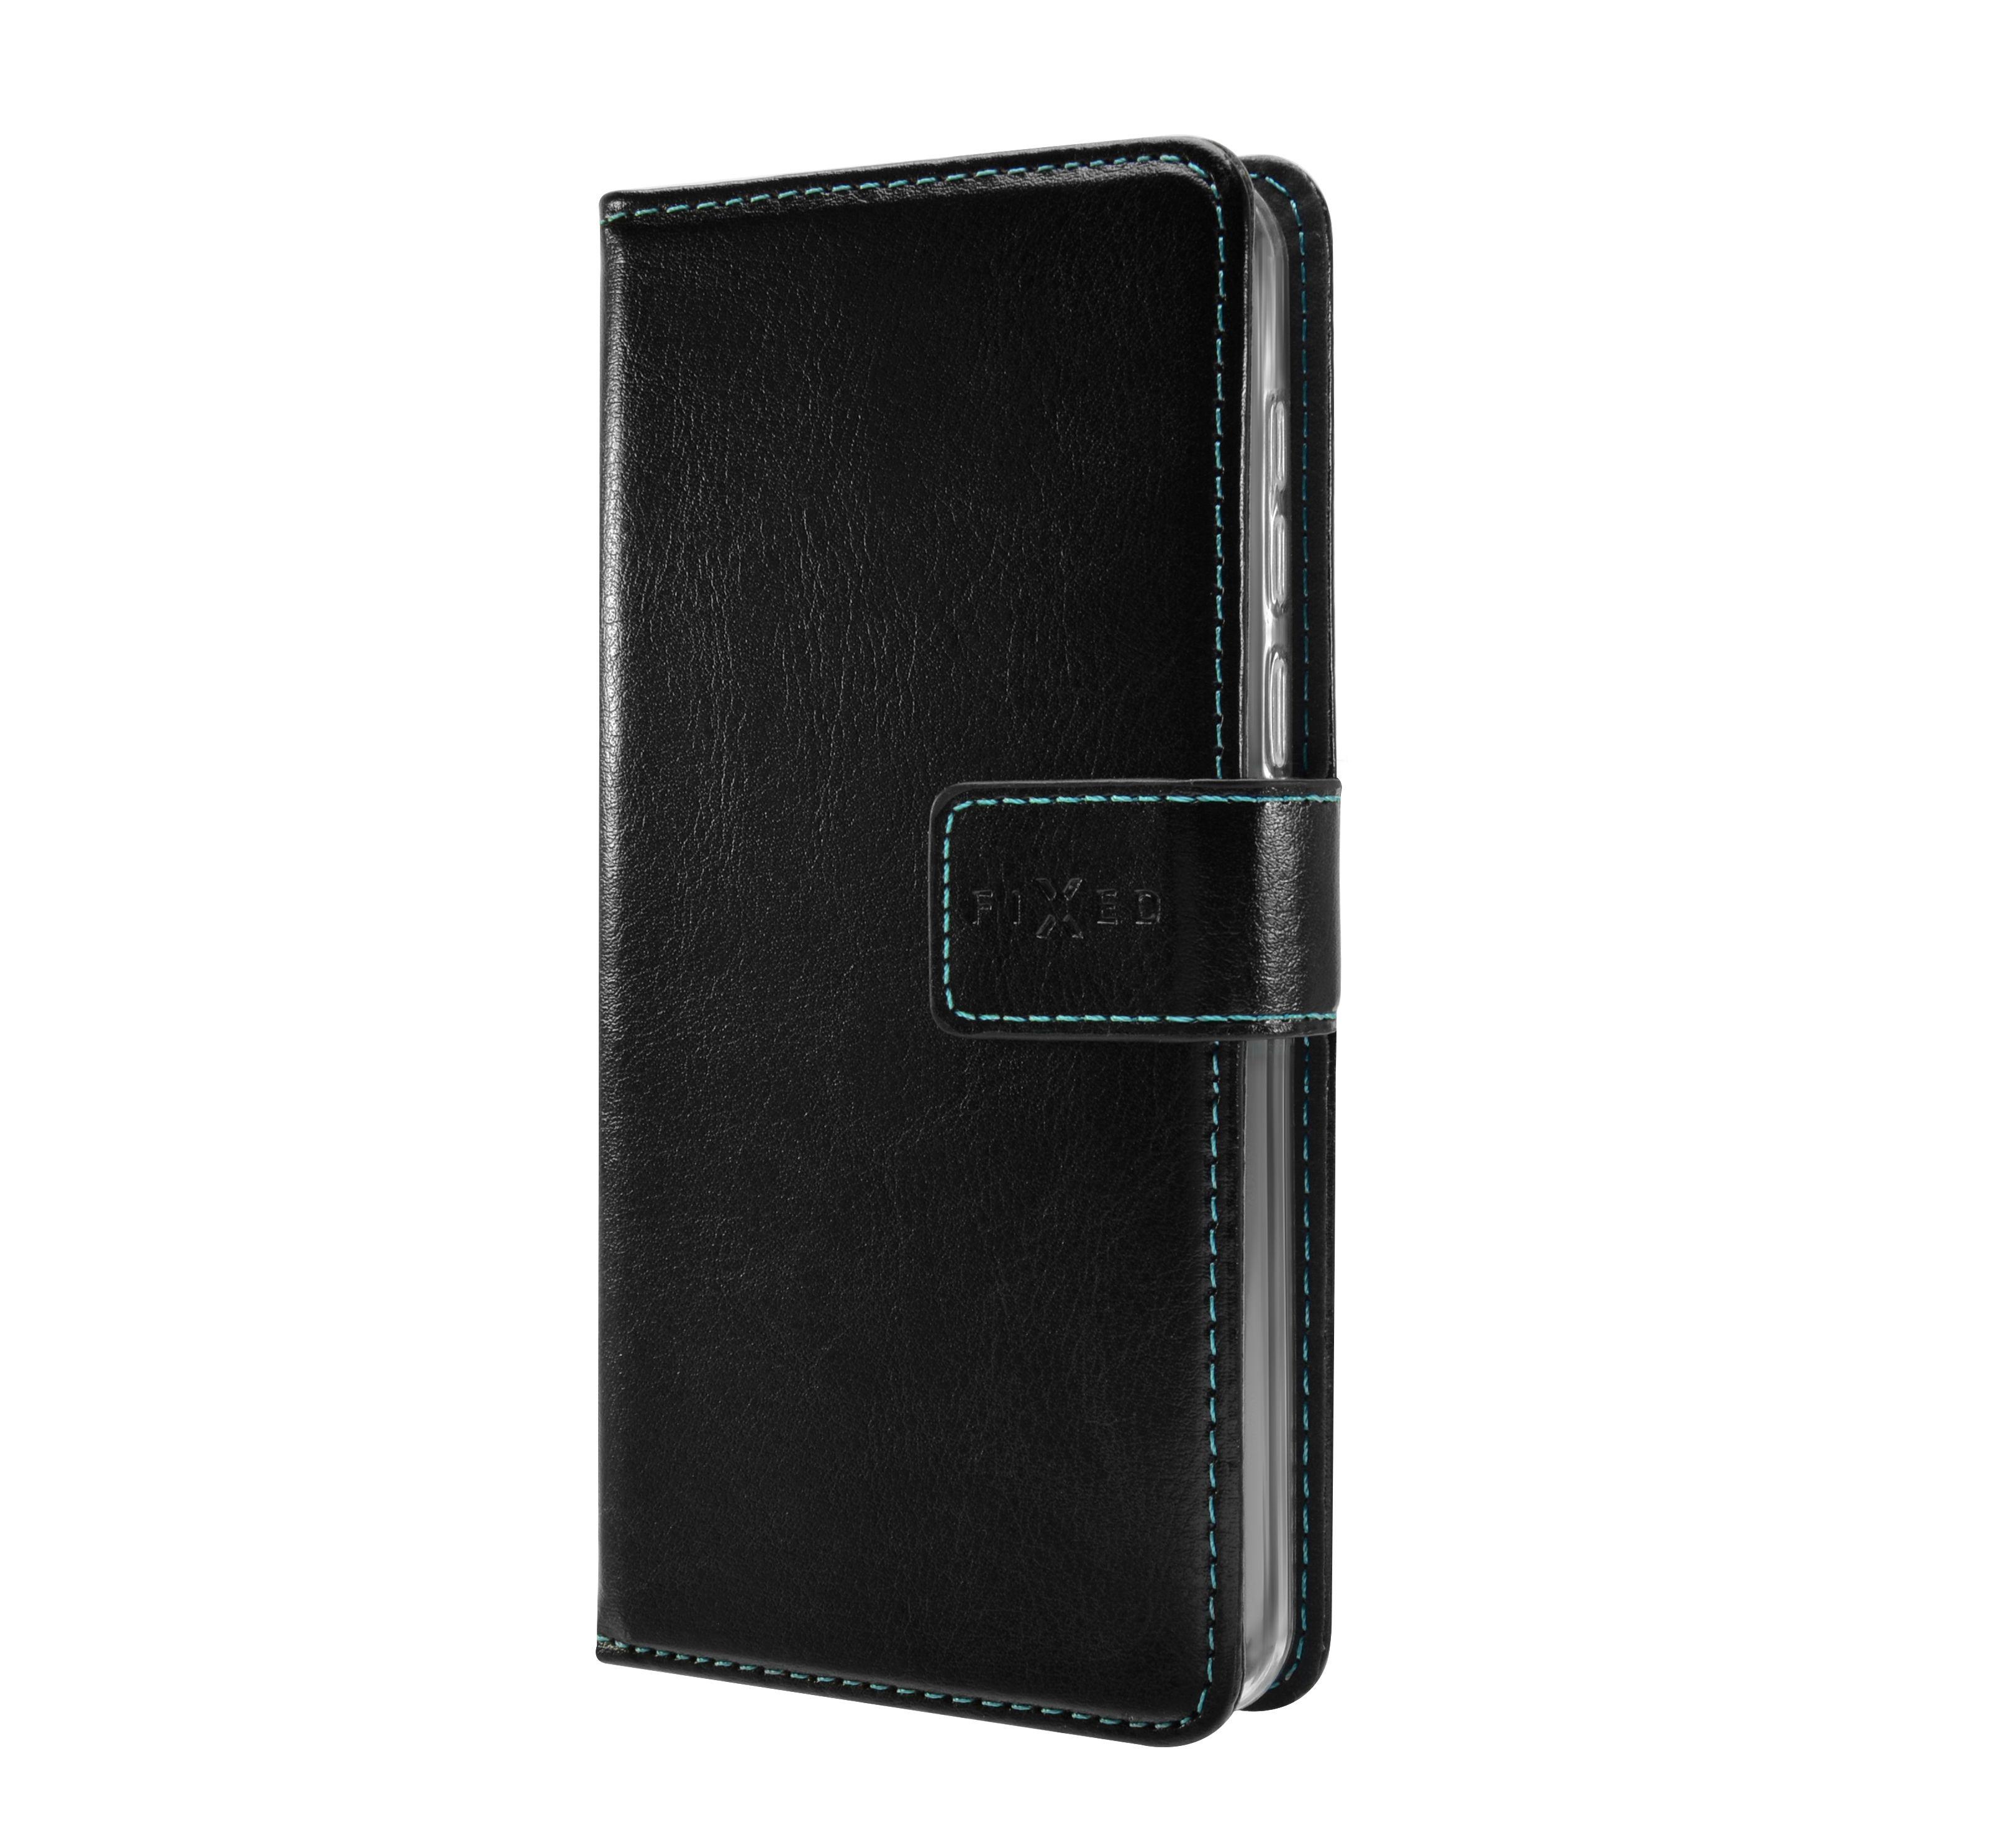 Pouzdro typu kniha FIXED Opus pro Samsung Galaxy Note10+, černé